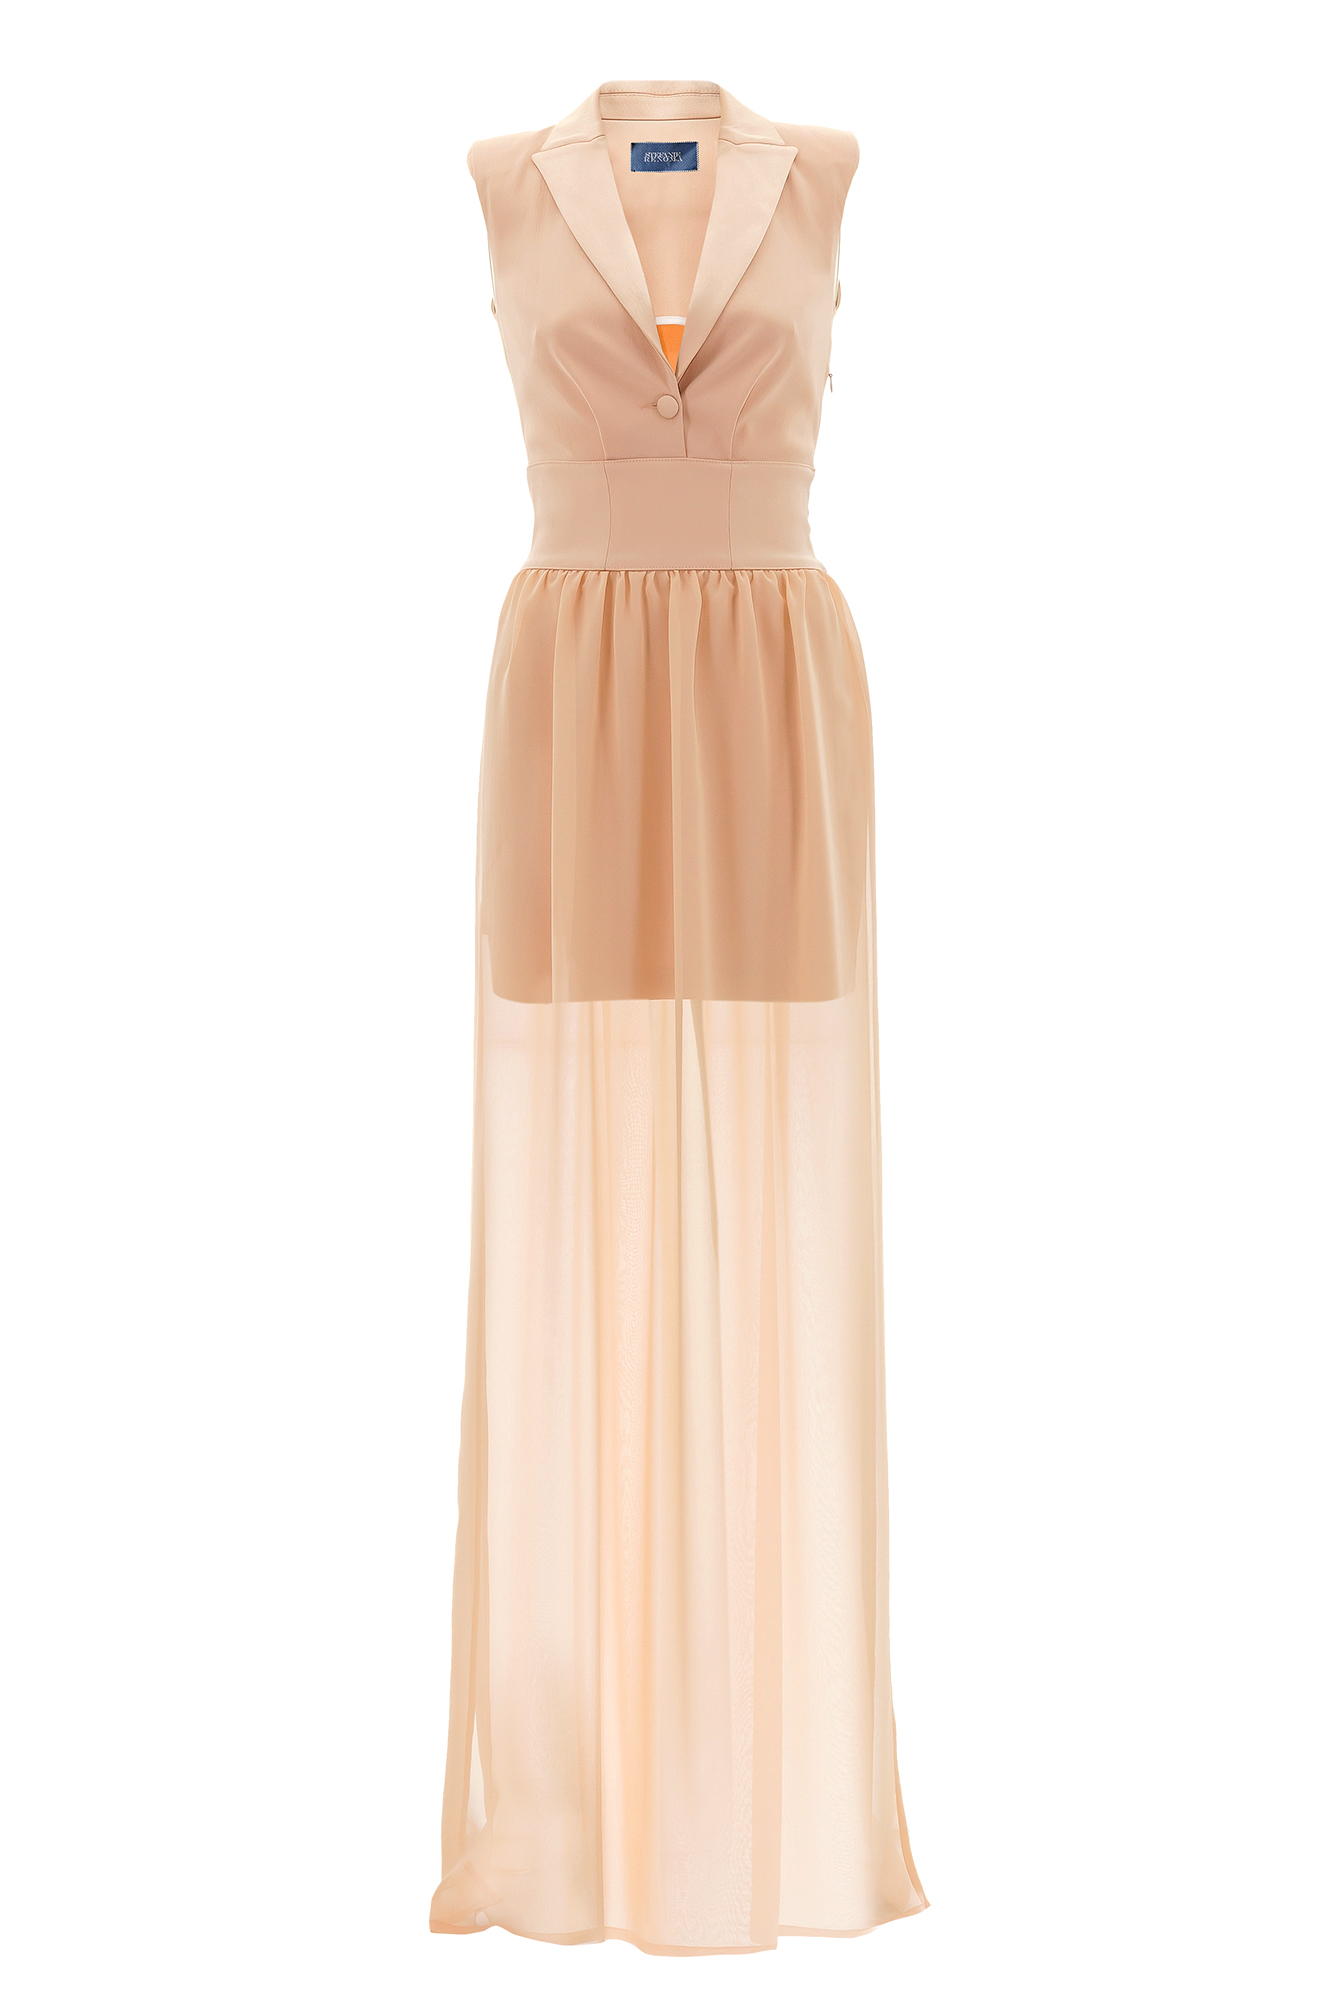 robe longue robe du soir robe rose stefanie renoma stefanie renoma. Black Bedroom Furniture Sets. Home Design Ideas